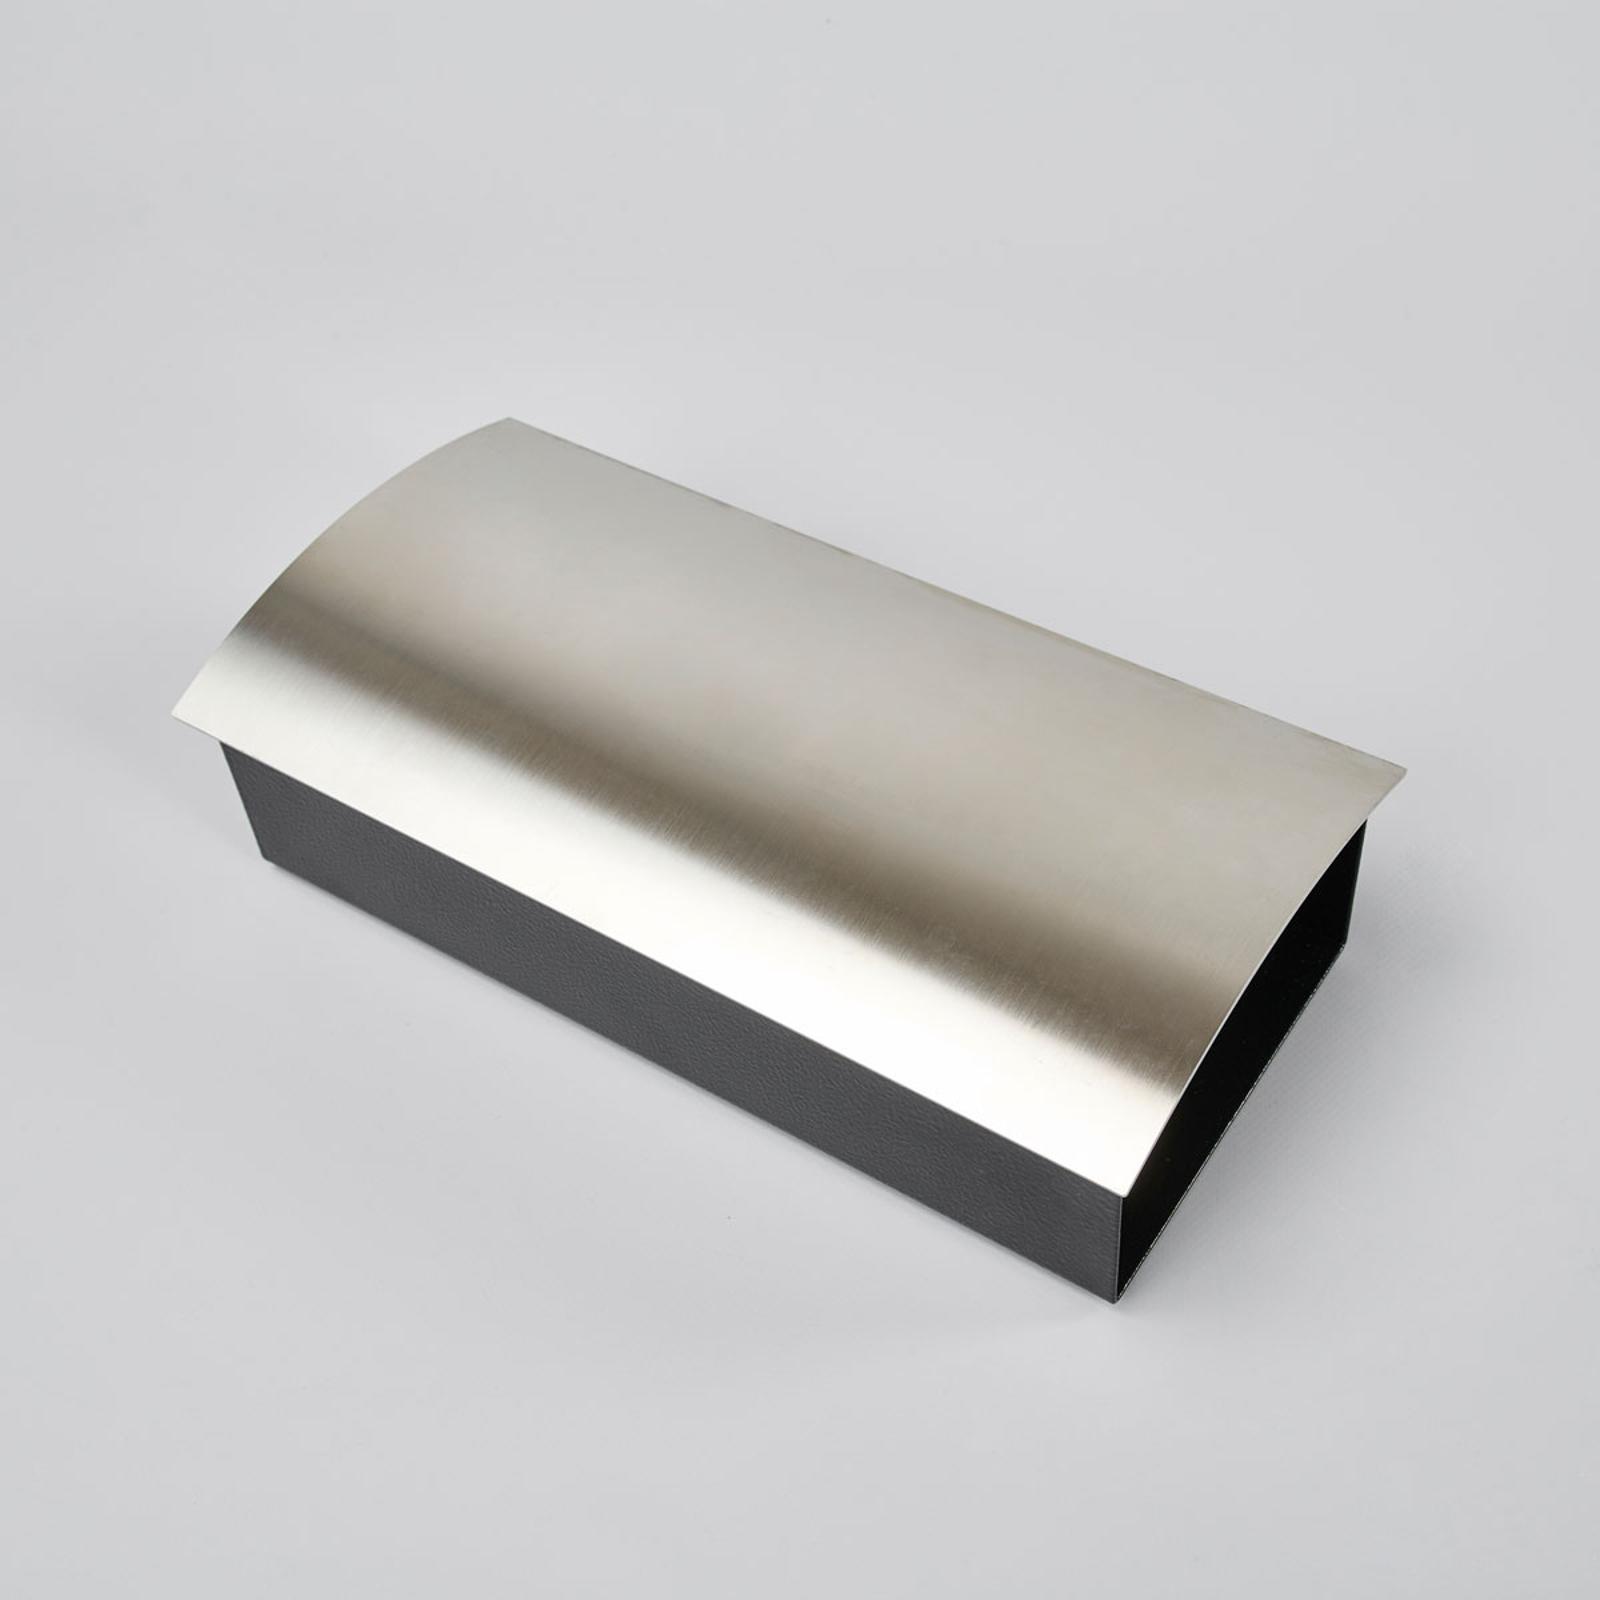 Luxueuse boîte à journal en inox Alani